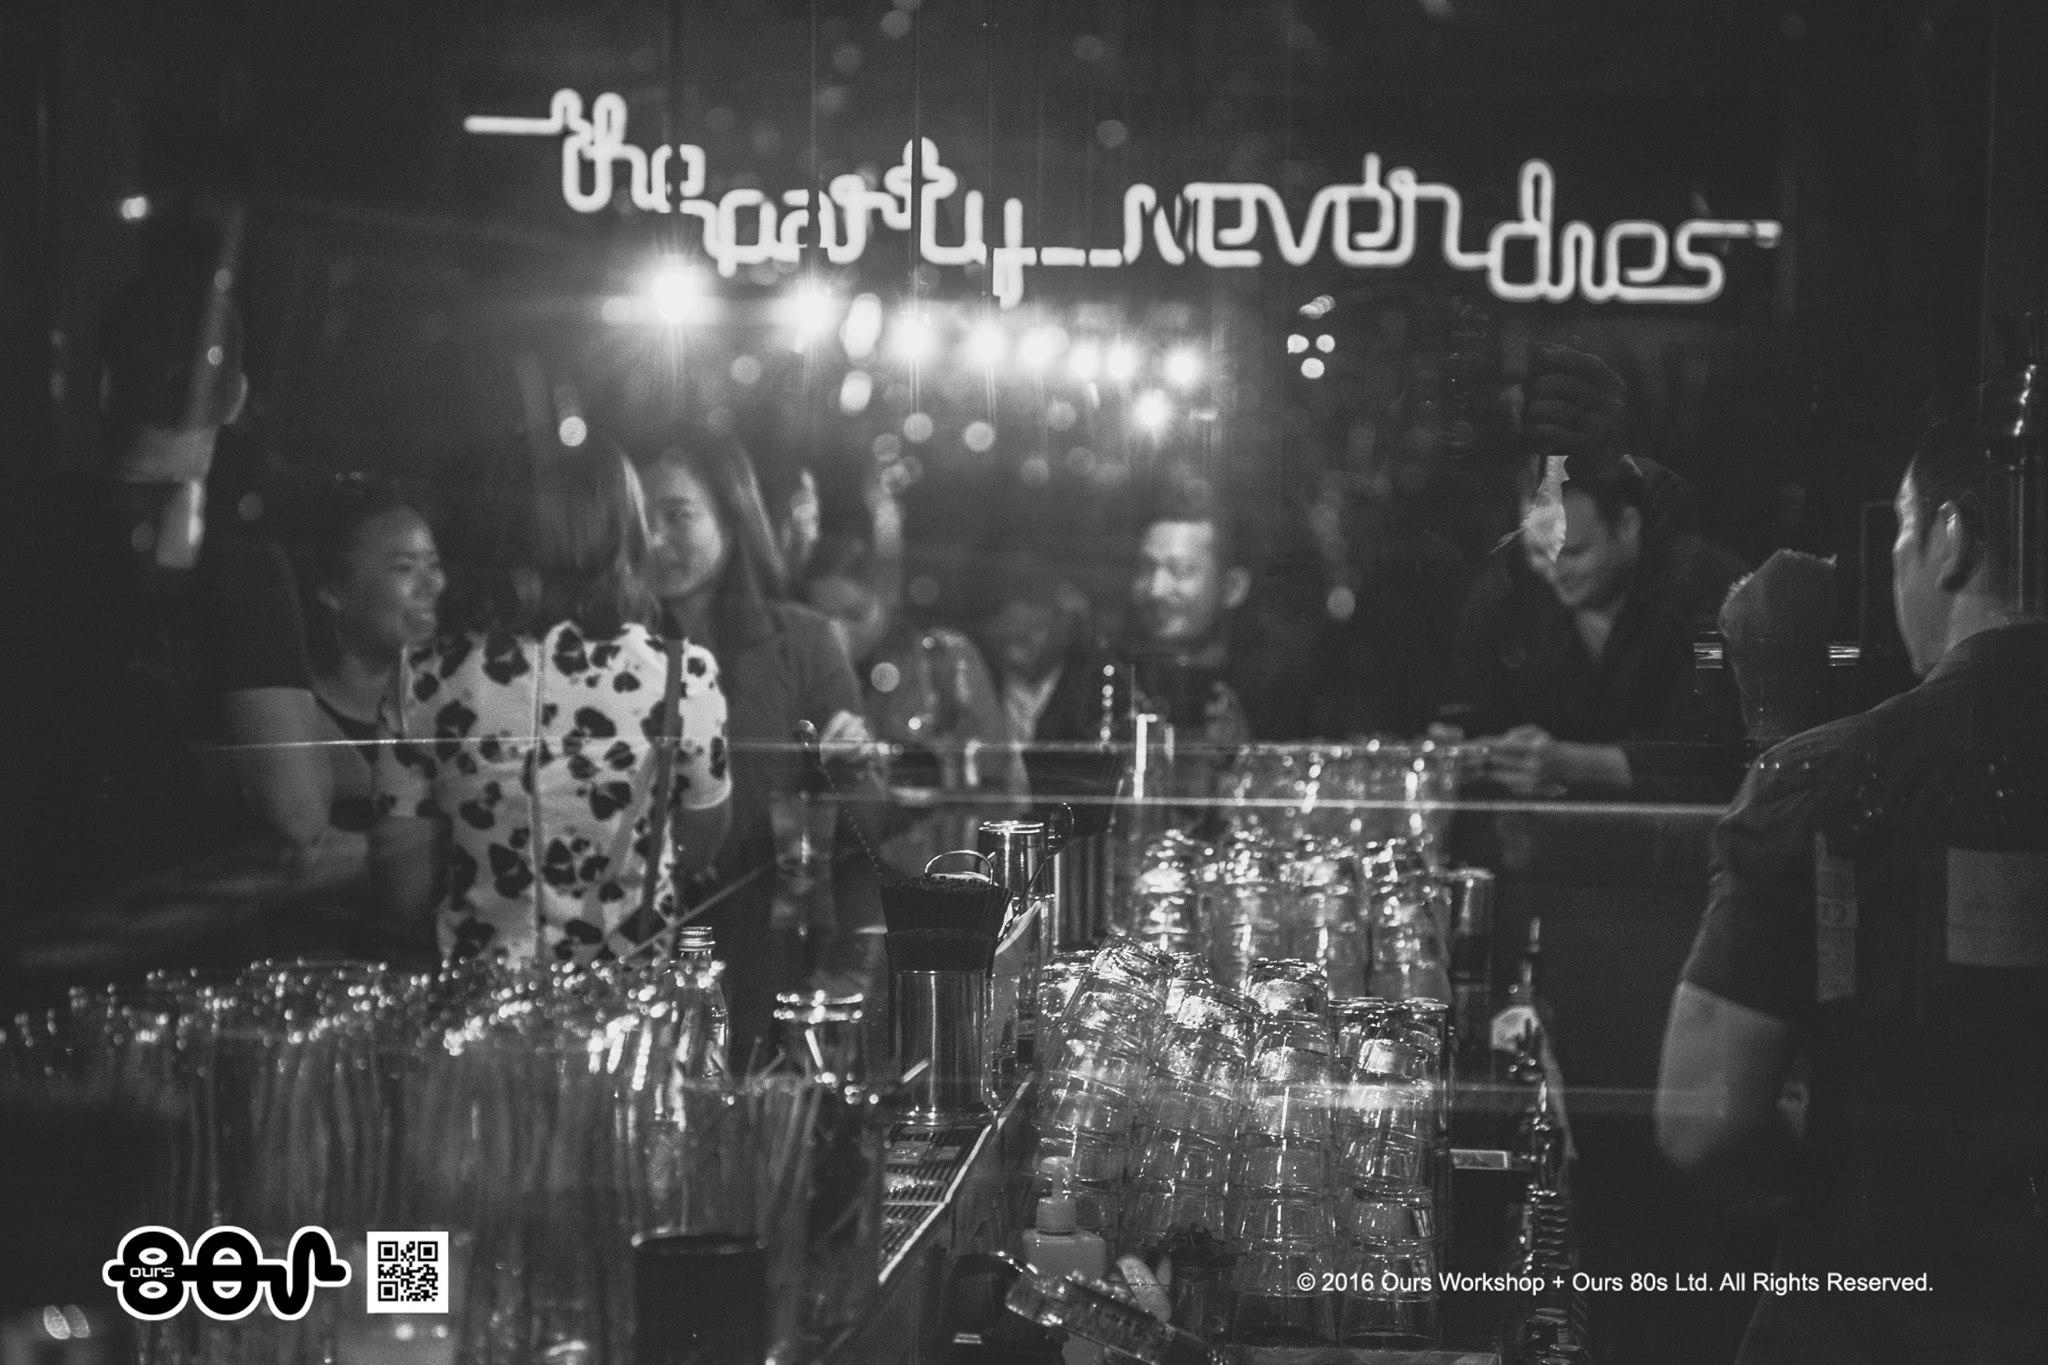 2016.12.01 RESULTS – hkclubbing.com 2016 Nightlife Awards Part 2